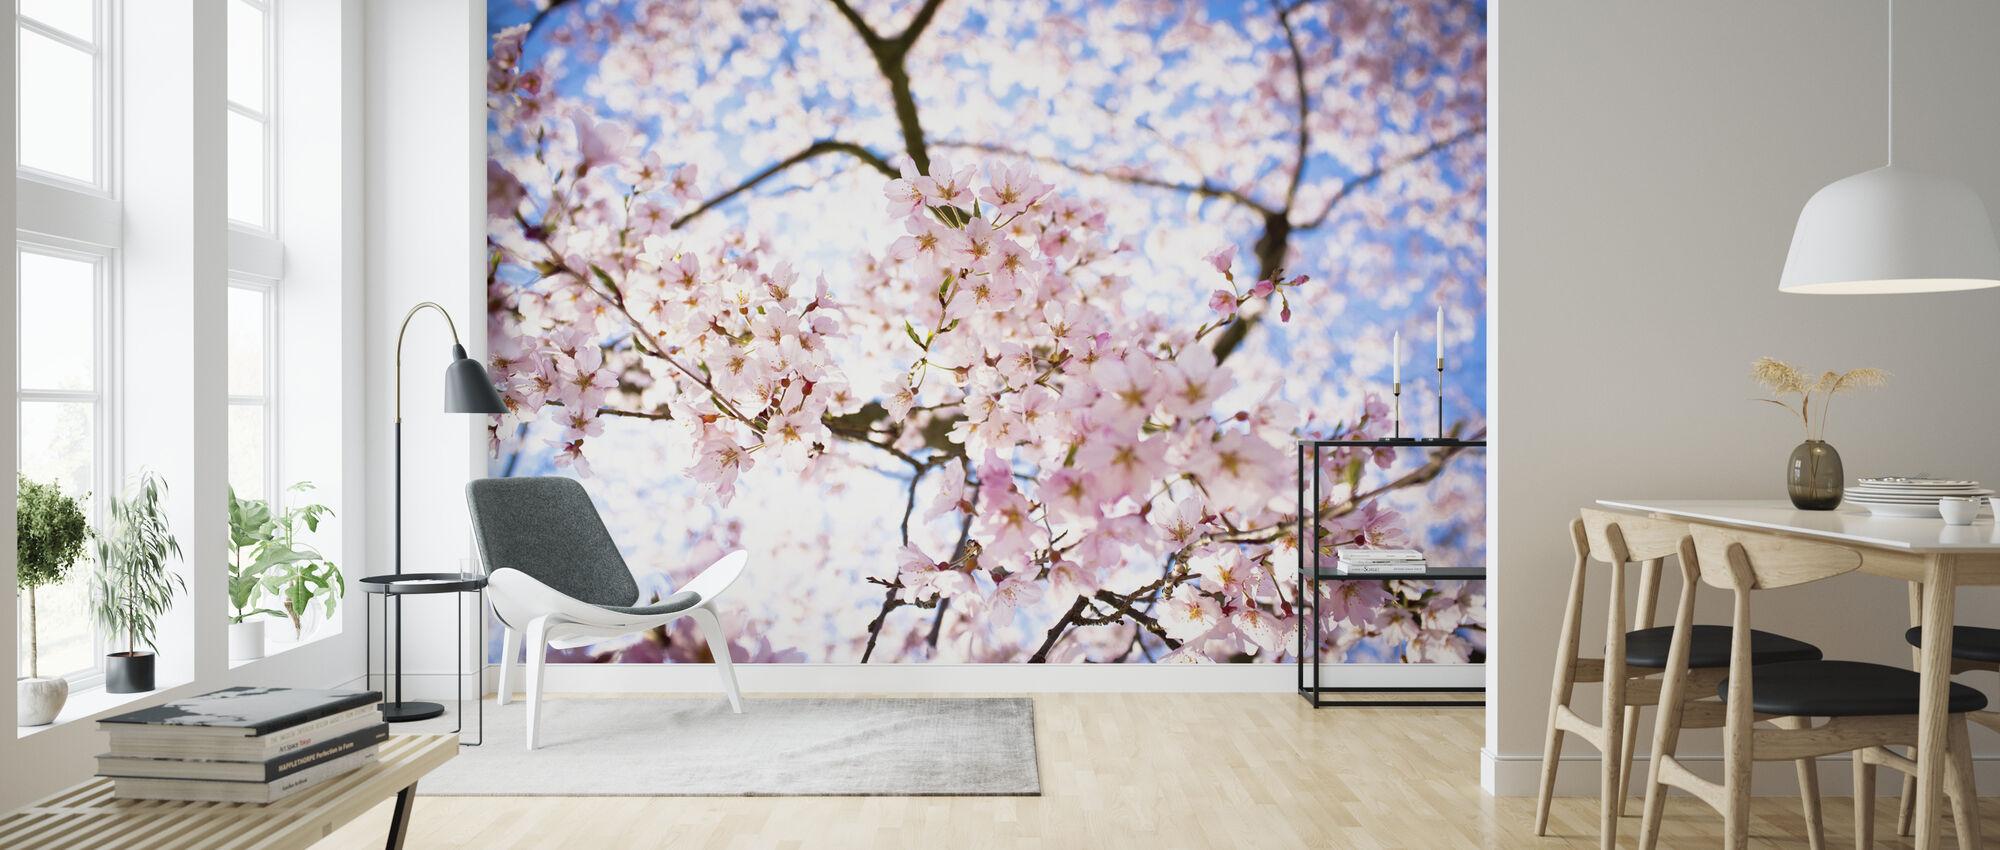 Weeping Cherry Tree Wall Murals Online Photowall